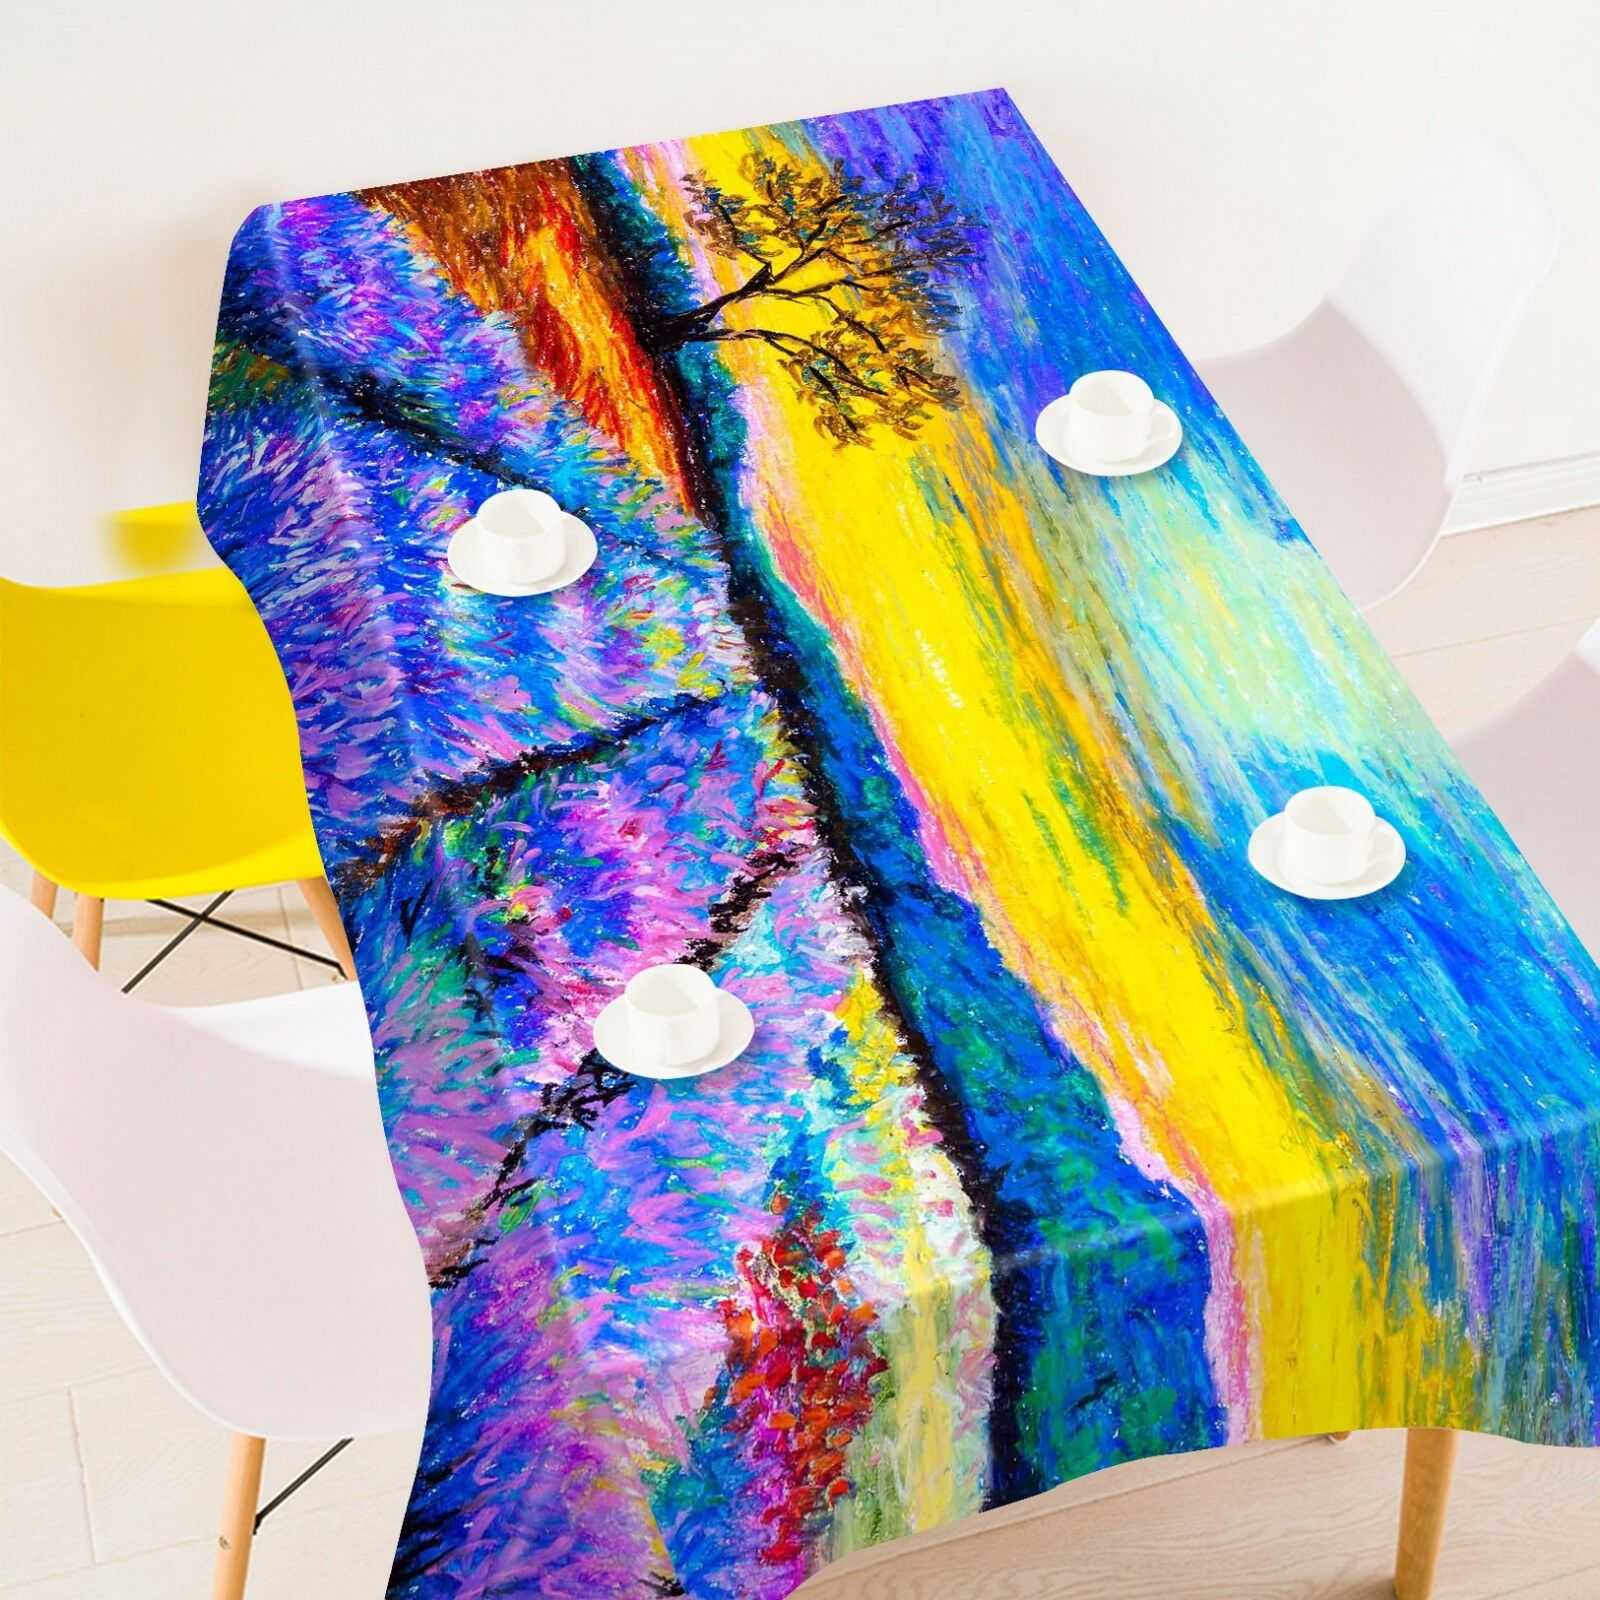 3D 3D 3D Paint Petal Sky 02 Tablecloth Table Cover Cloth Birthday Party Event AJ Jenny 192356